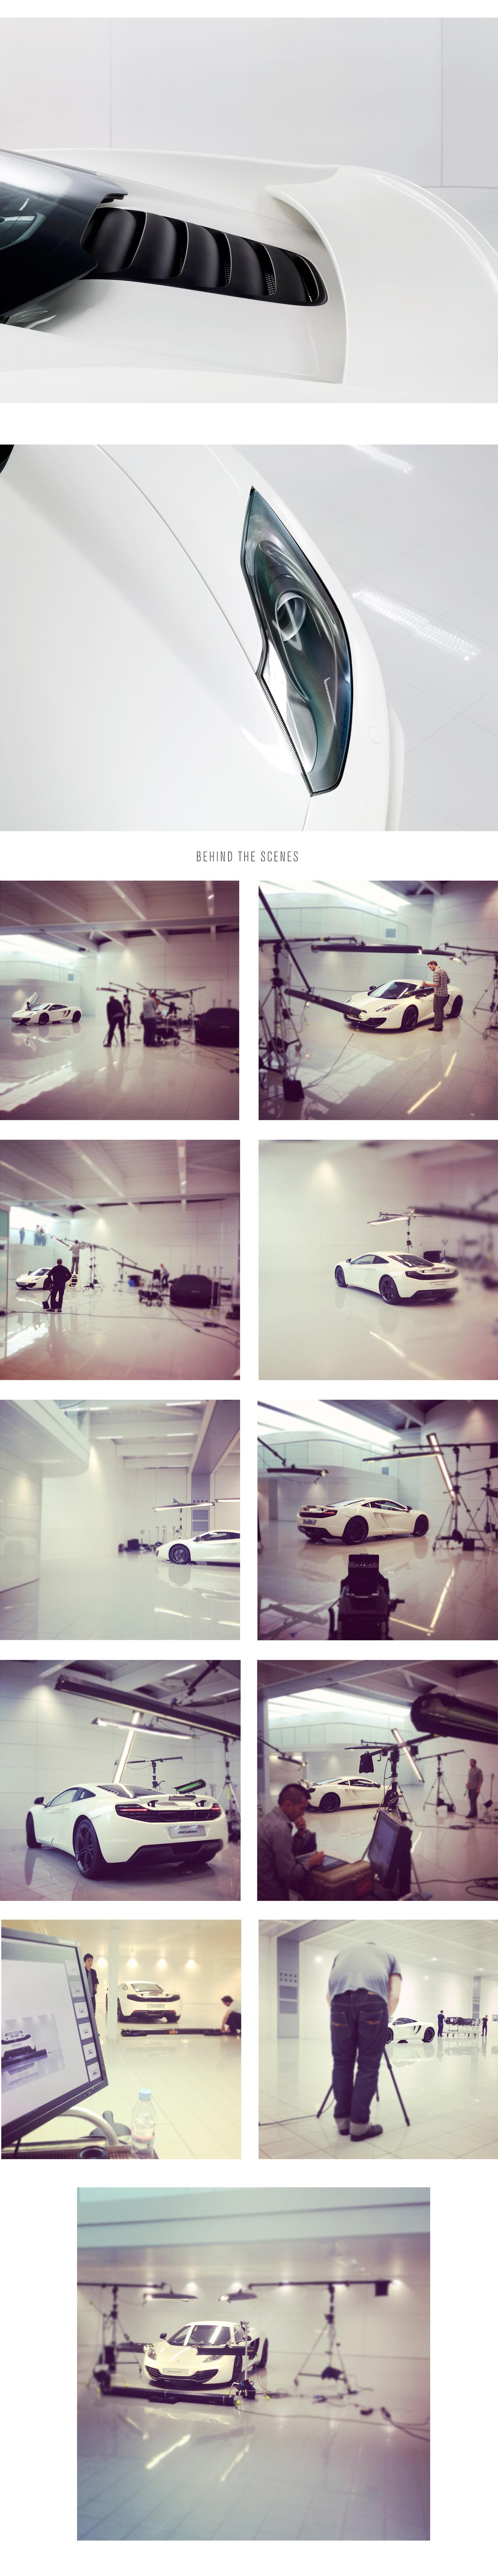 cars.mclaren.com mp4-12c McLaren supercar